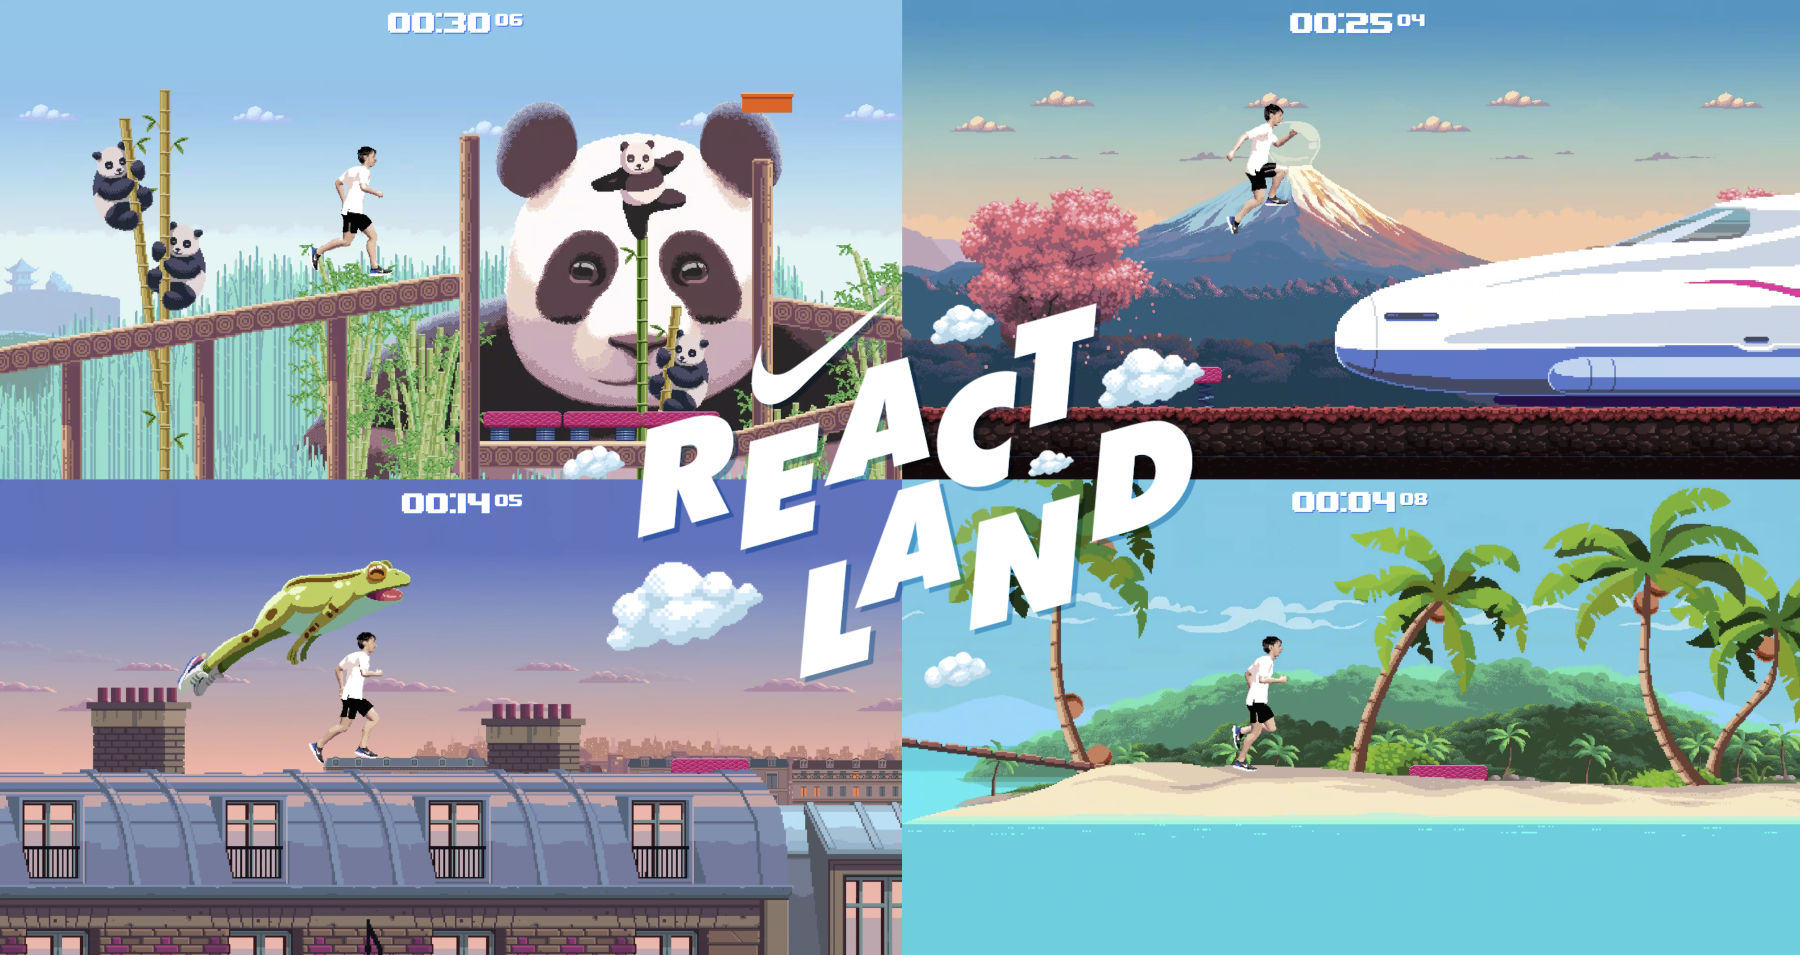 1 REACTLAND HERO - گیمیفیکیشن در تبلیغات؛ زمین بازی برای جذب مشتری